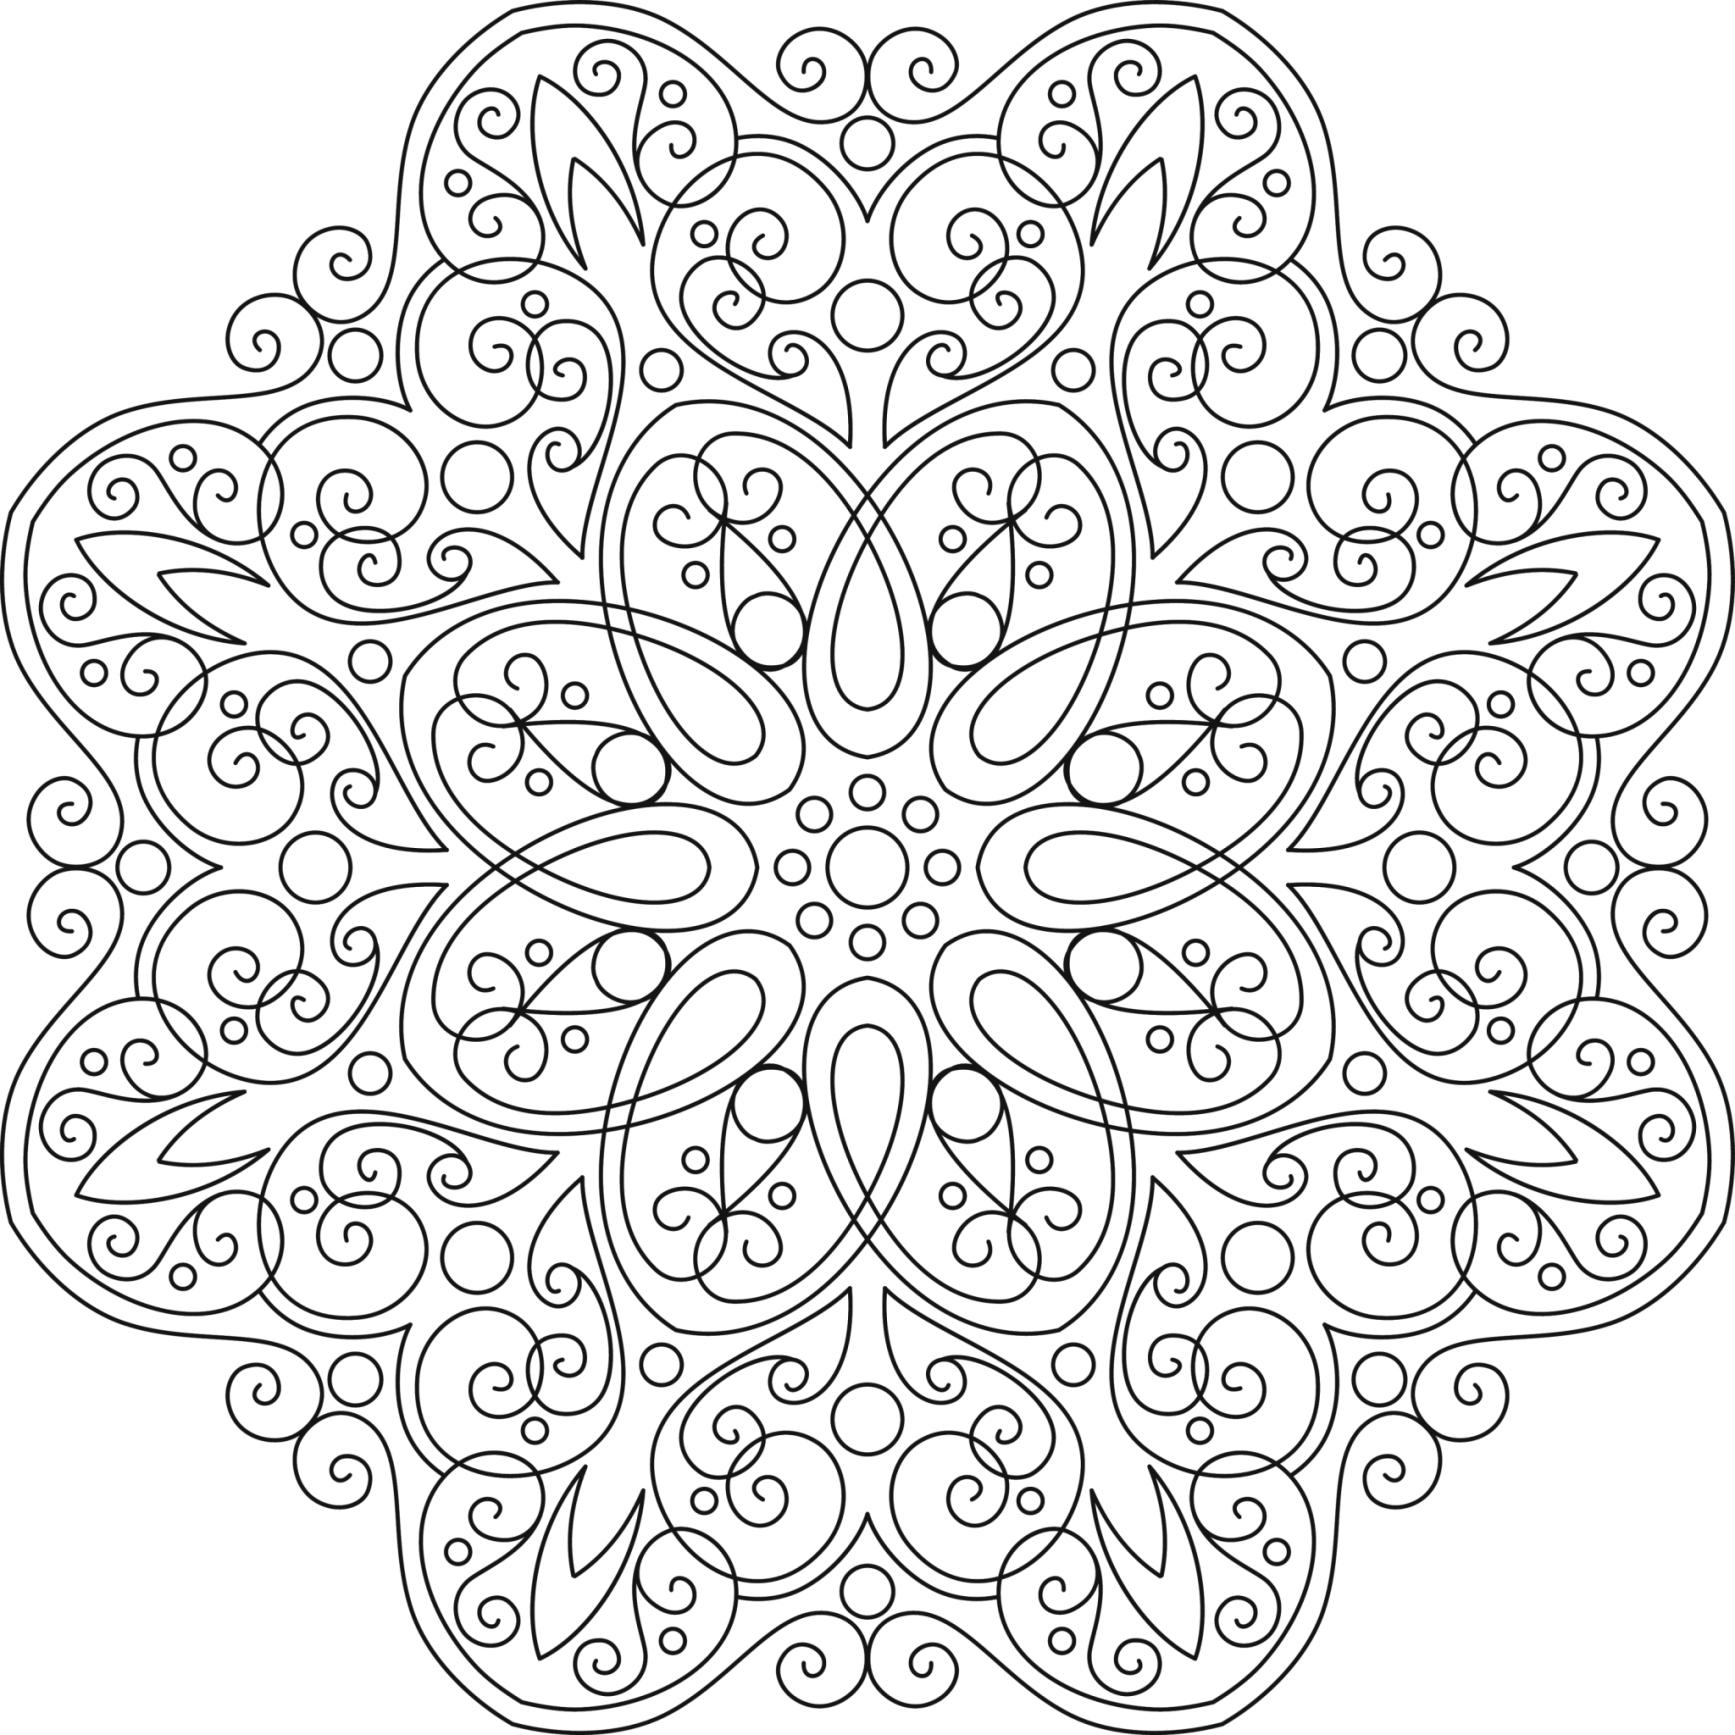 Mándalas para colorear, dibujos mandalas para imprimir